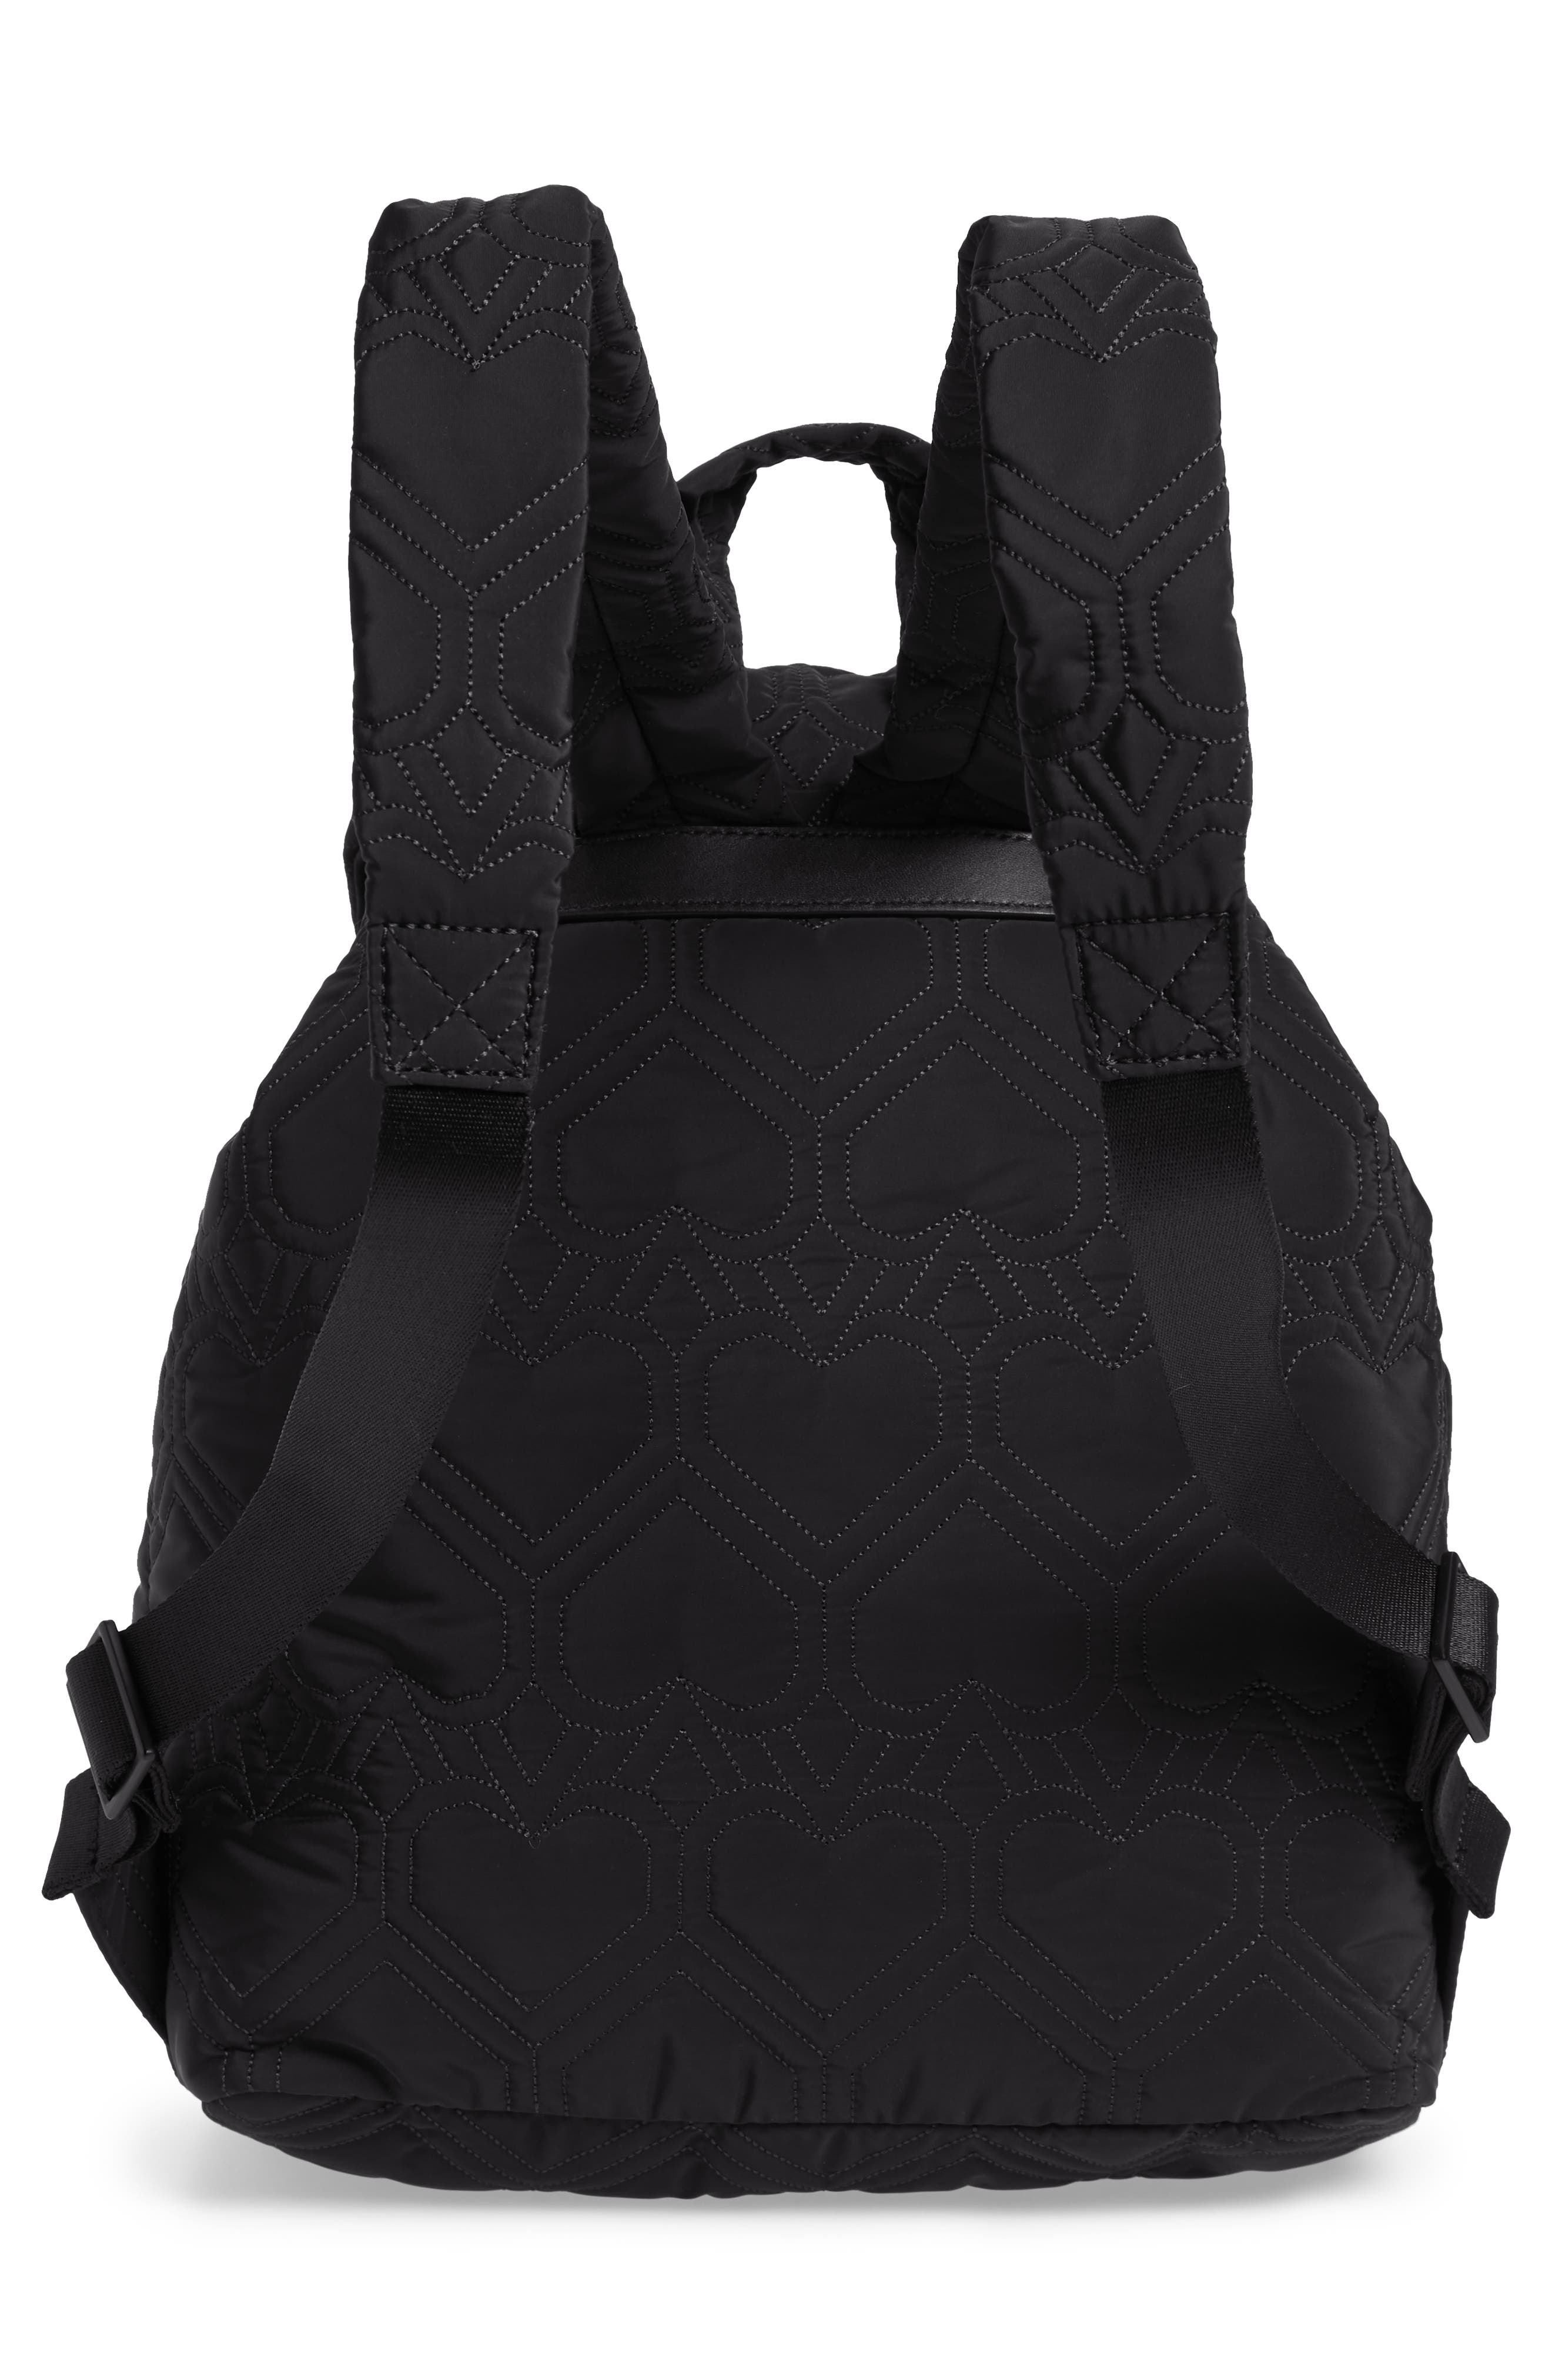 KATE SPADE NEW YORK, large jayne quilted nylon backpack, Alternate thumbnail 3, color, BLACK